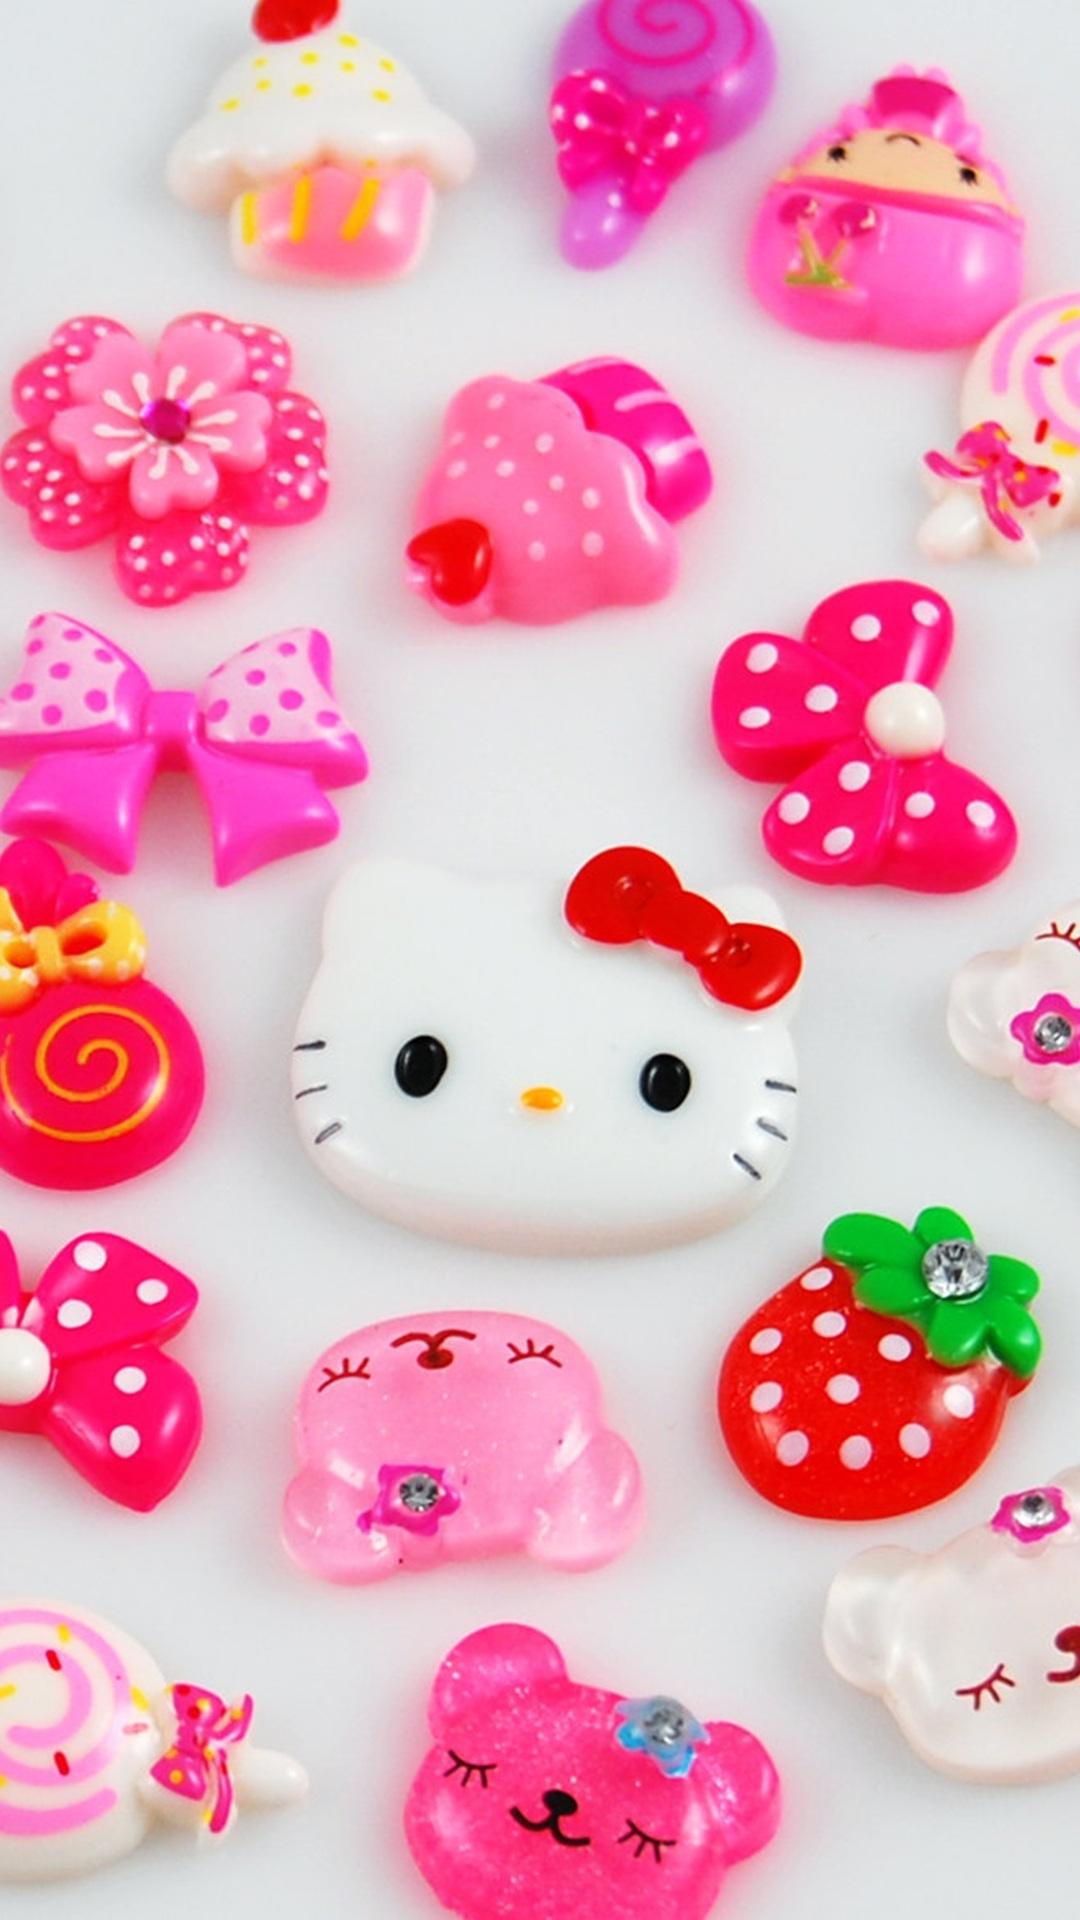 Cute Hello Kitty Iphone Plus Screen Wallpaper Home Screen Cute Wallpaper For Mobile 1080x1920 Download Hd Wallpaper Wallpapertip